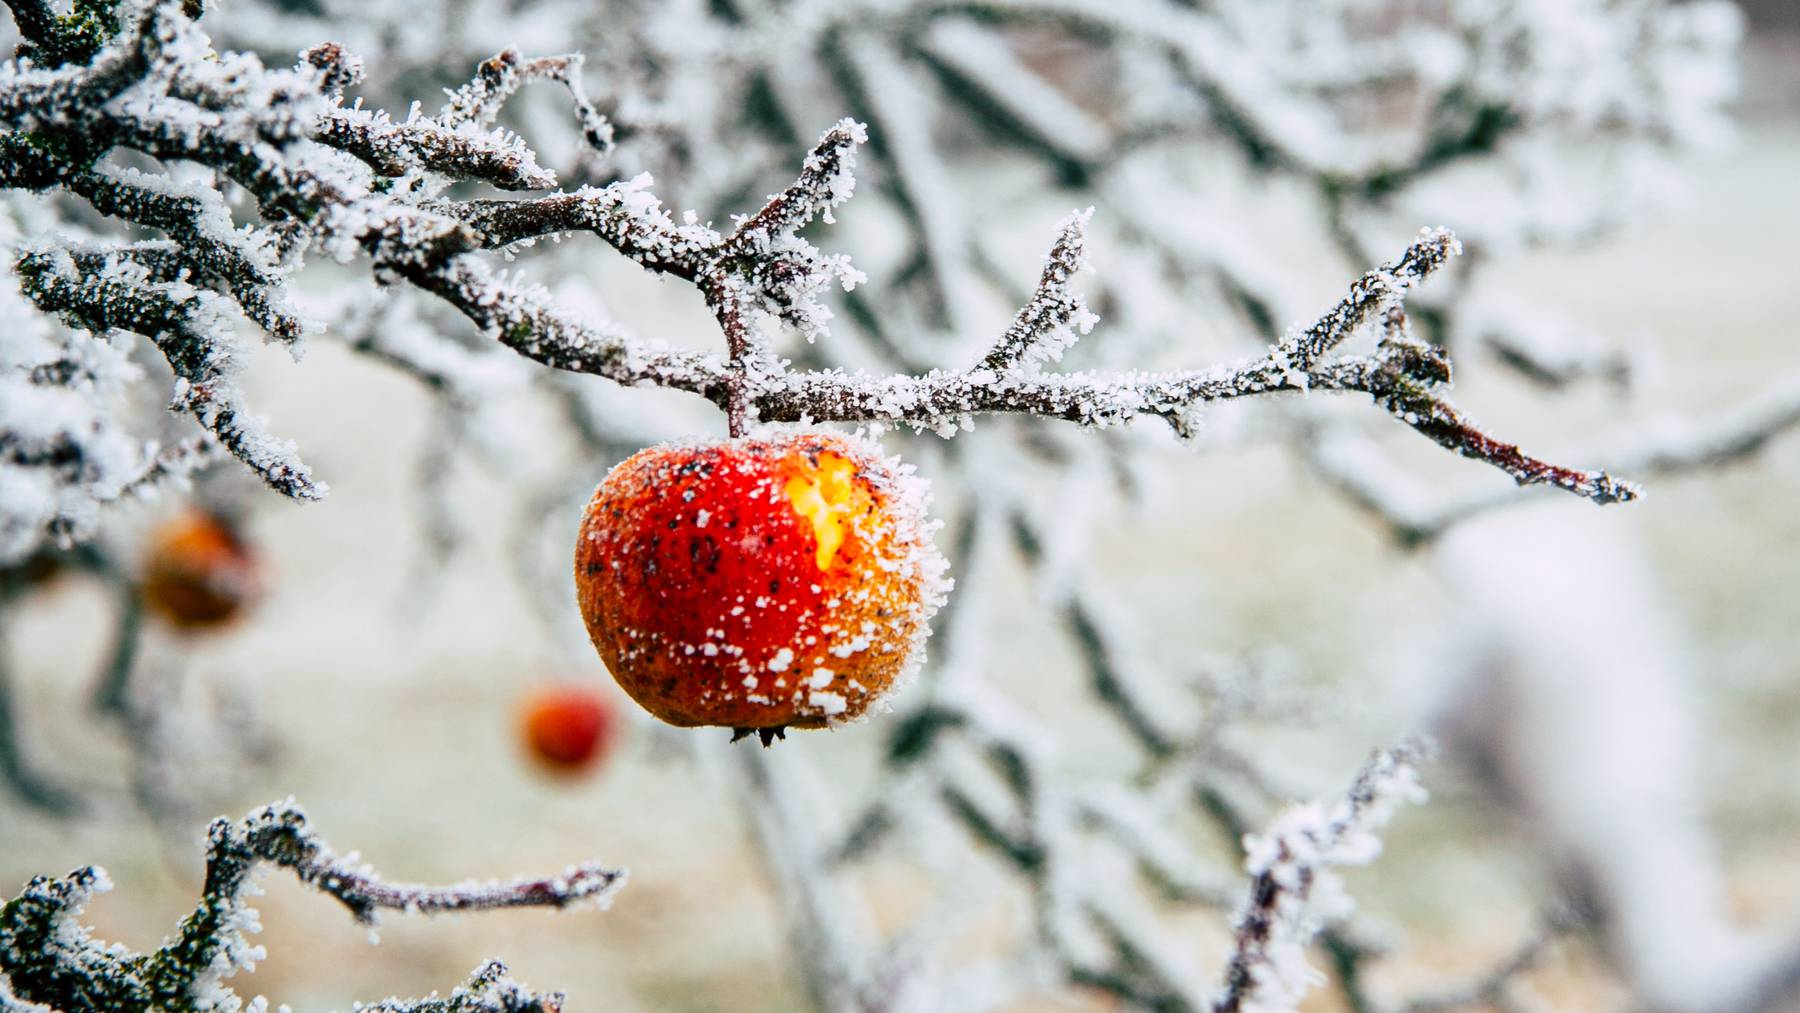 Apfel-Frost_Unsplash